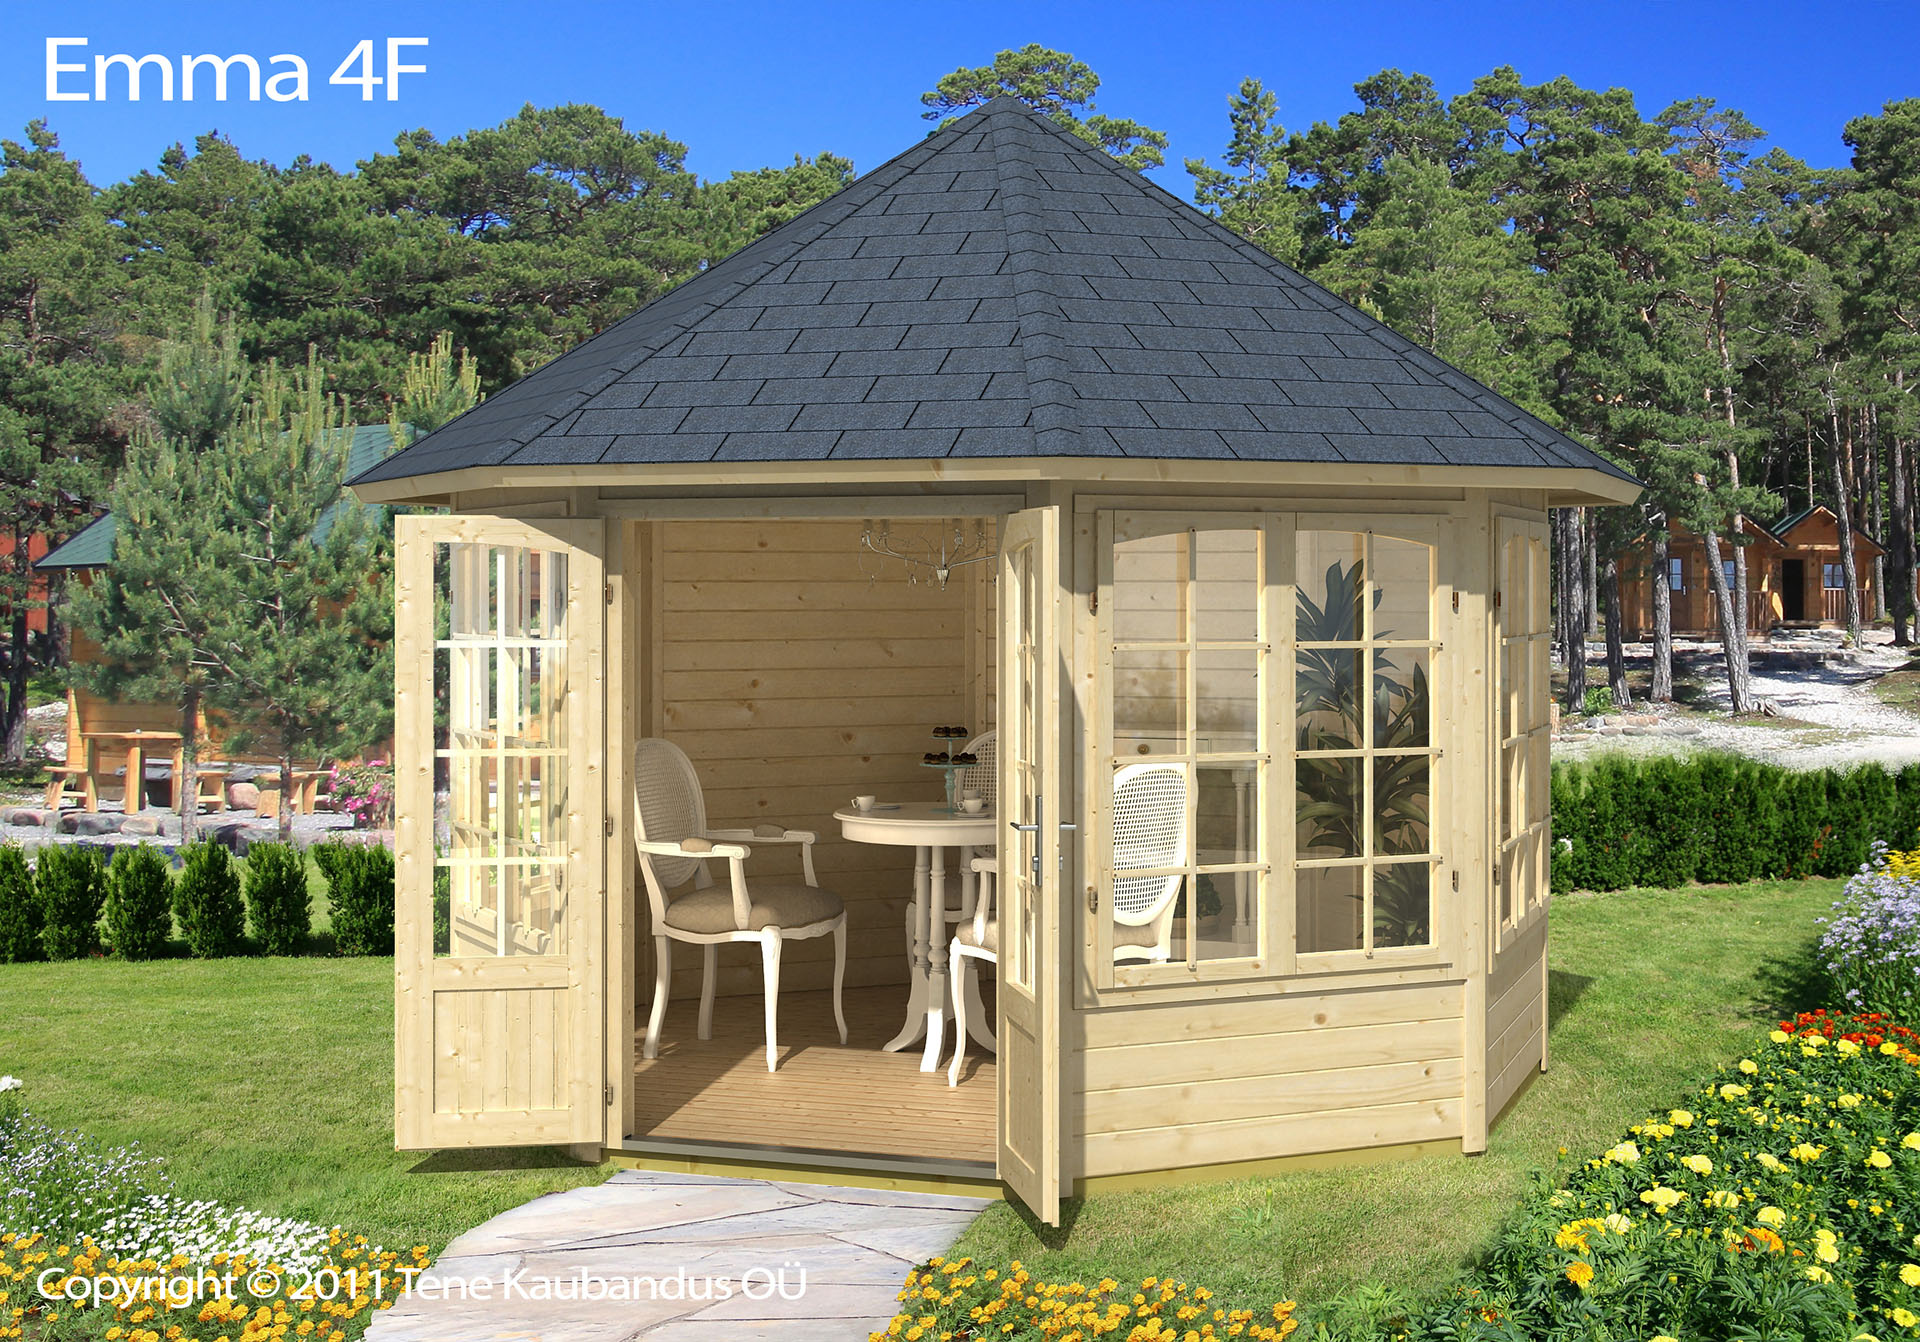 Magrethe 10m2 pavillon i træ med 4 vinduer fra solundhuse.dk